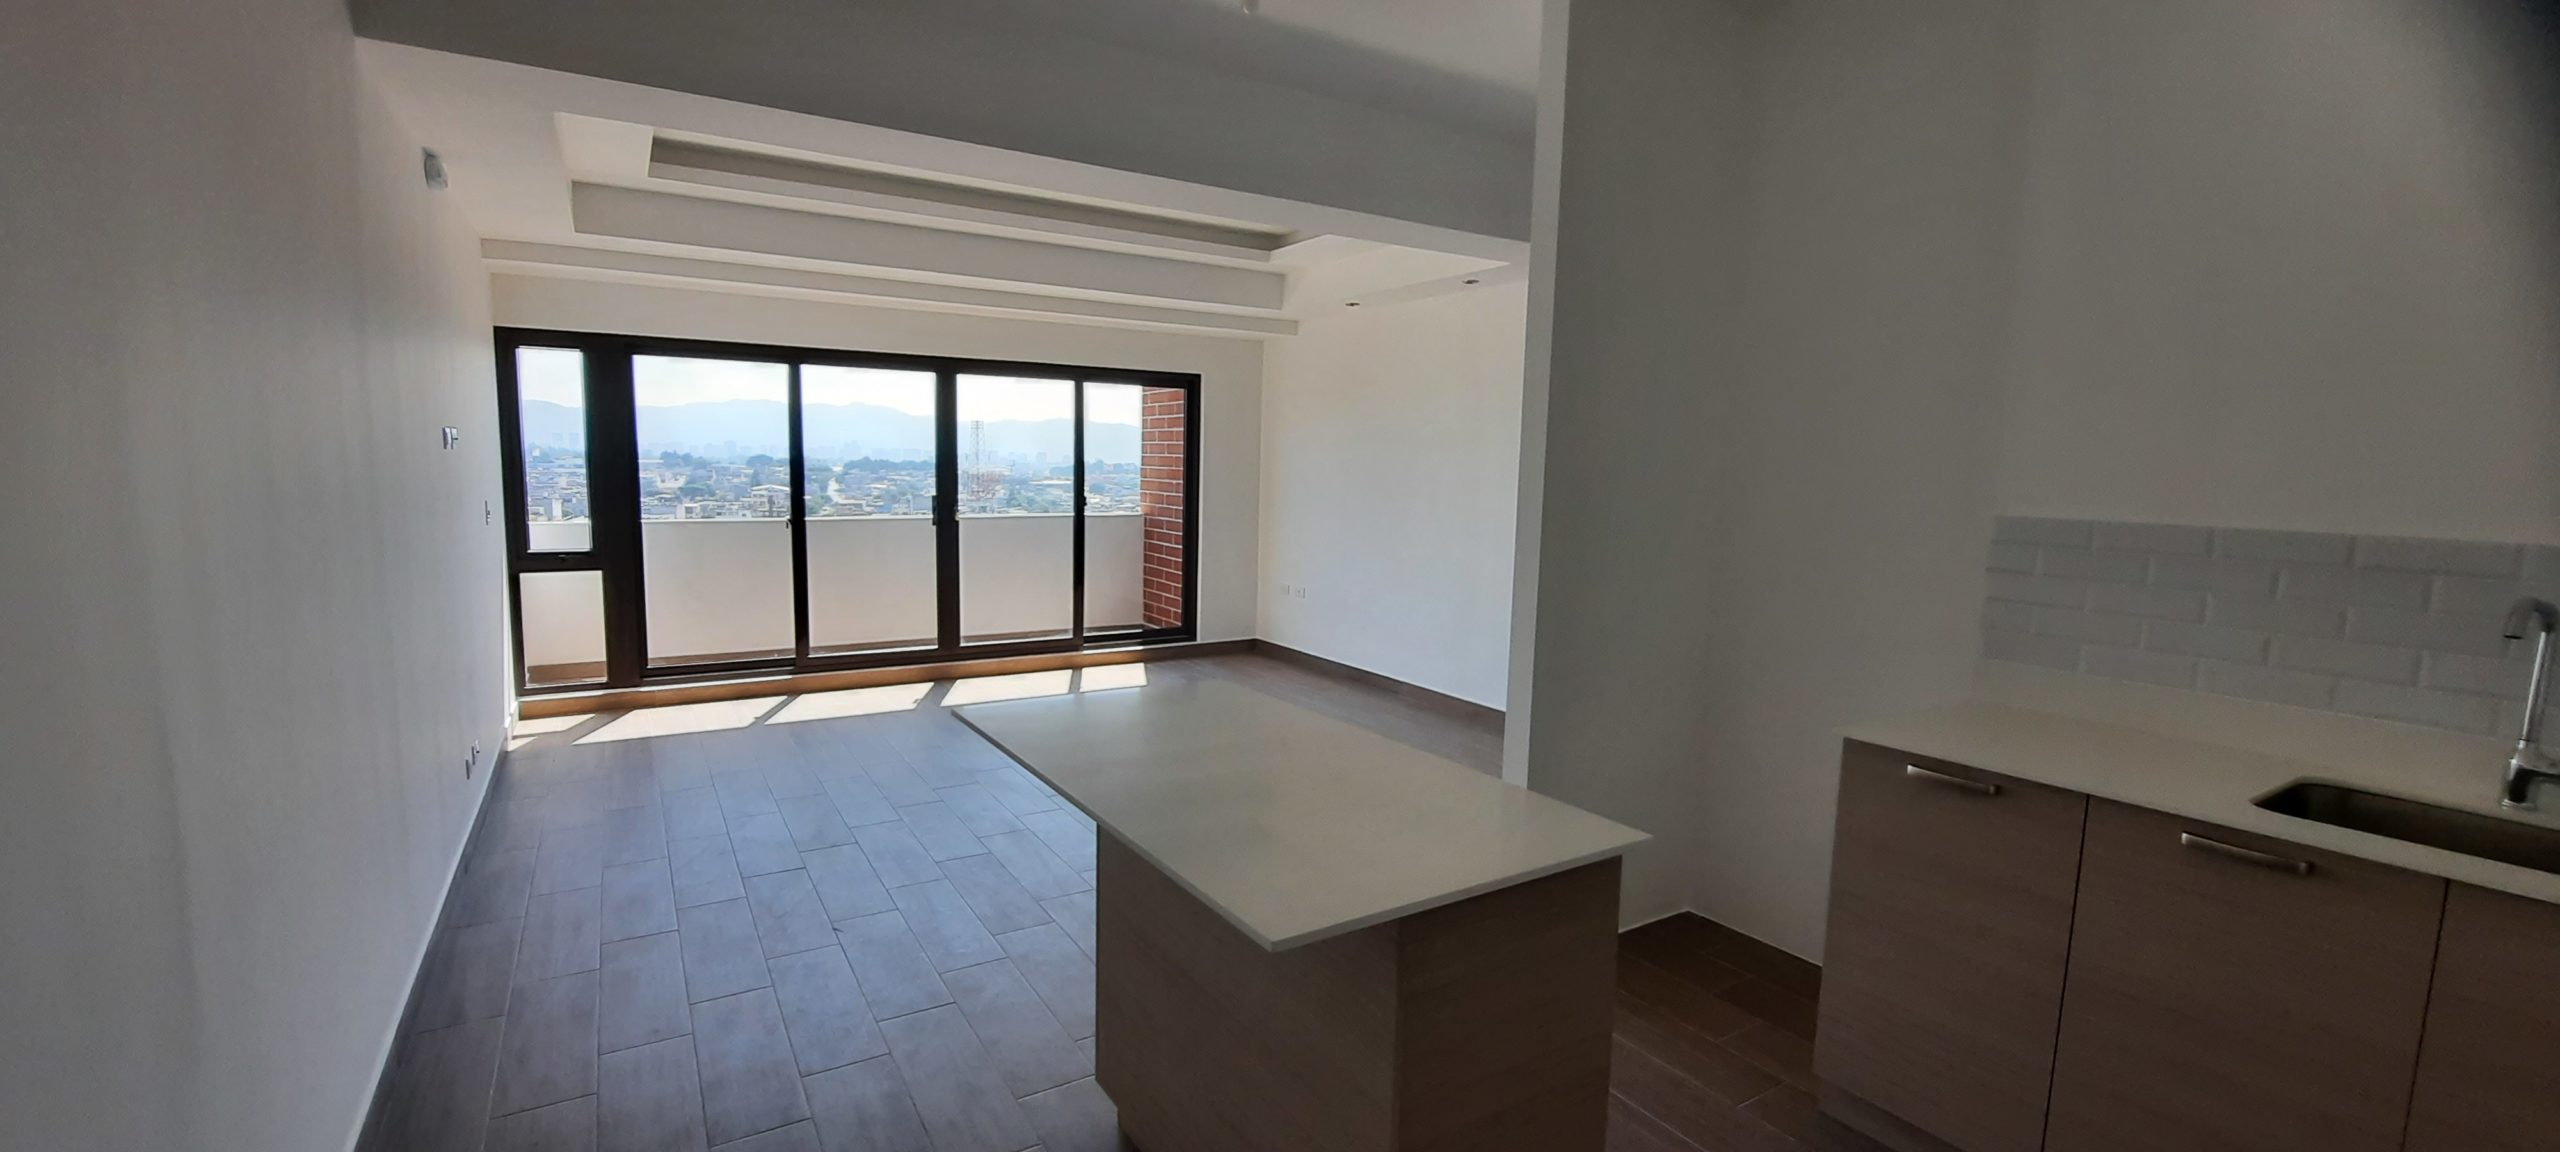 Apartamento en Venta Ubicado en Edificio Moderno de Zona 11